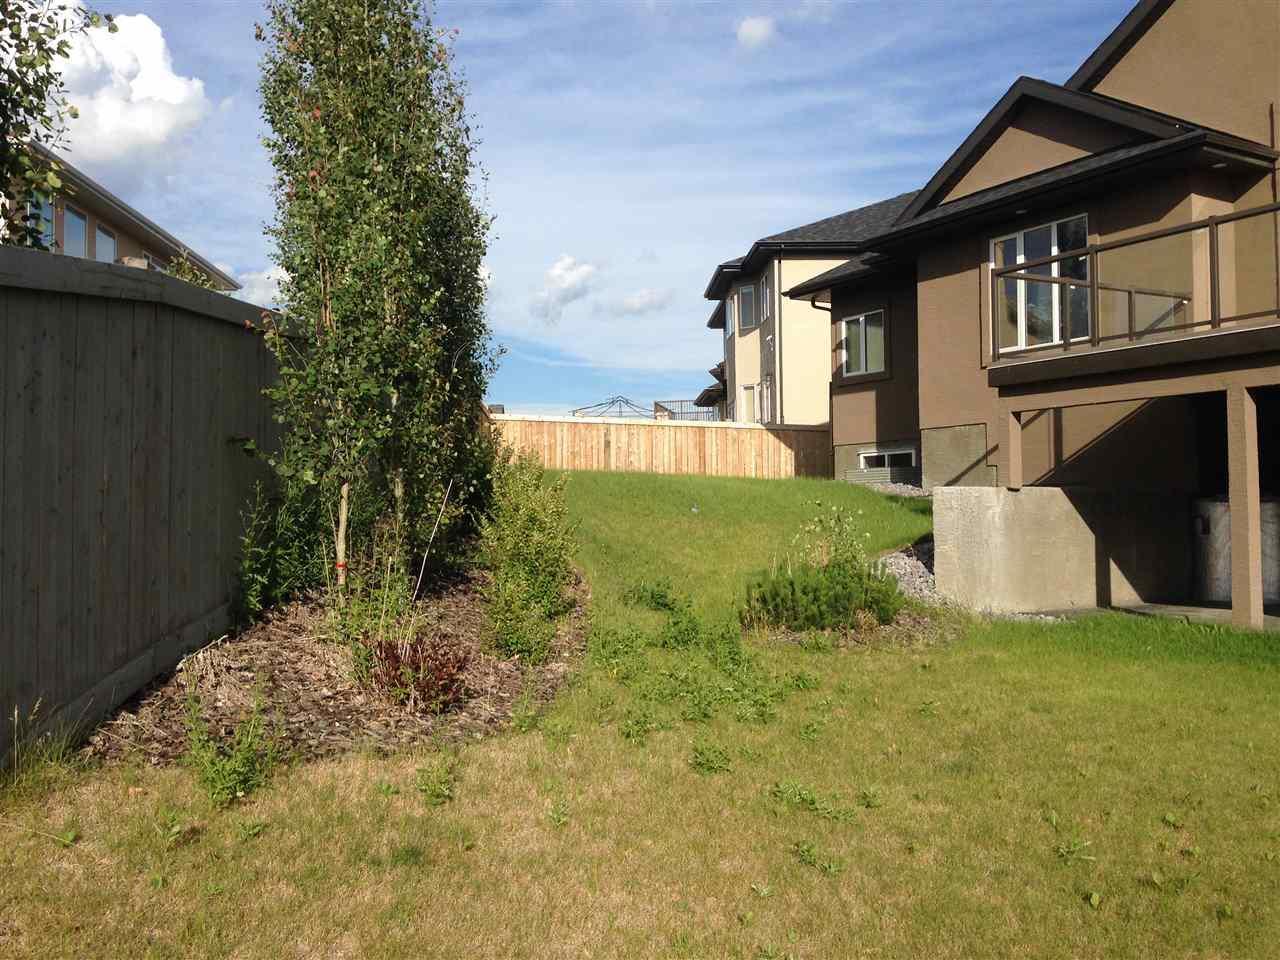 1239 Adamson Dr Sw, Edmonton, Alberta  T6W 0V5 - Photo 3 - E4053551